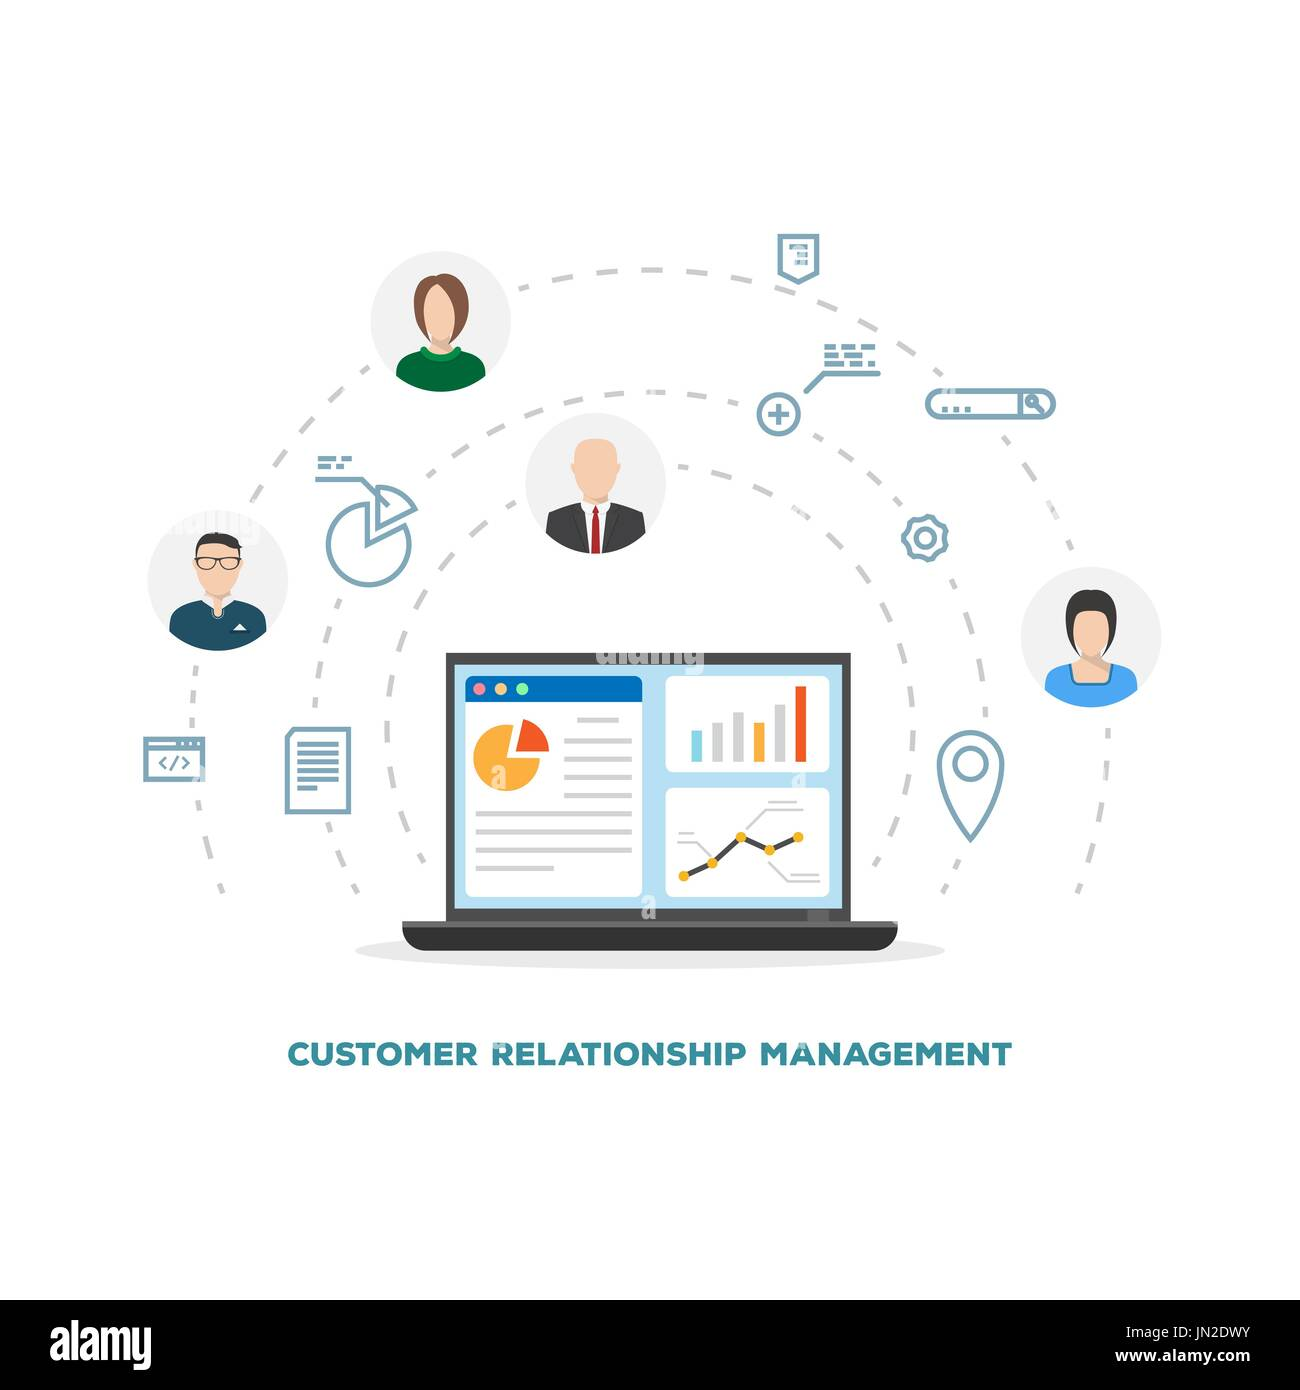 Customer relationship management - Stock Image